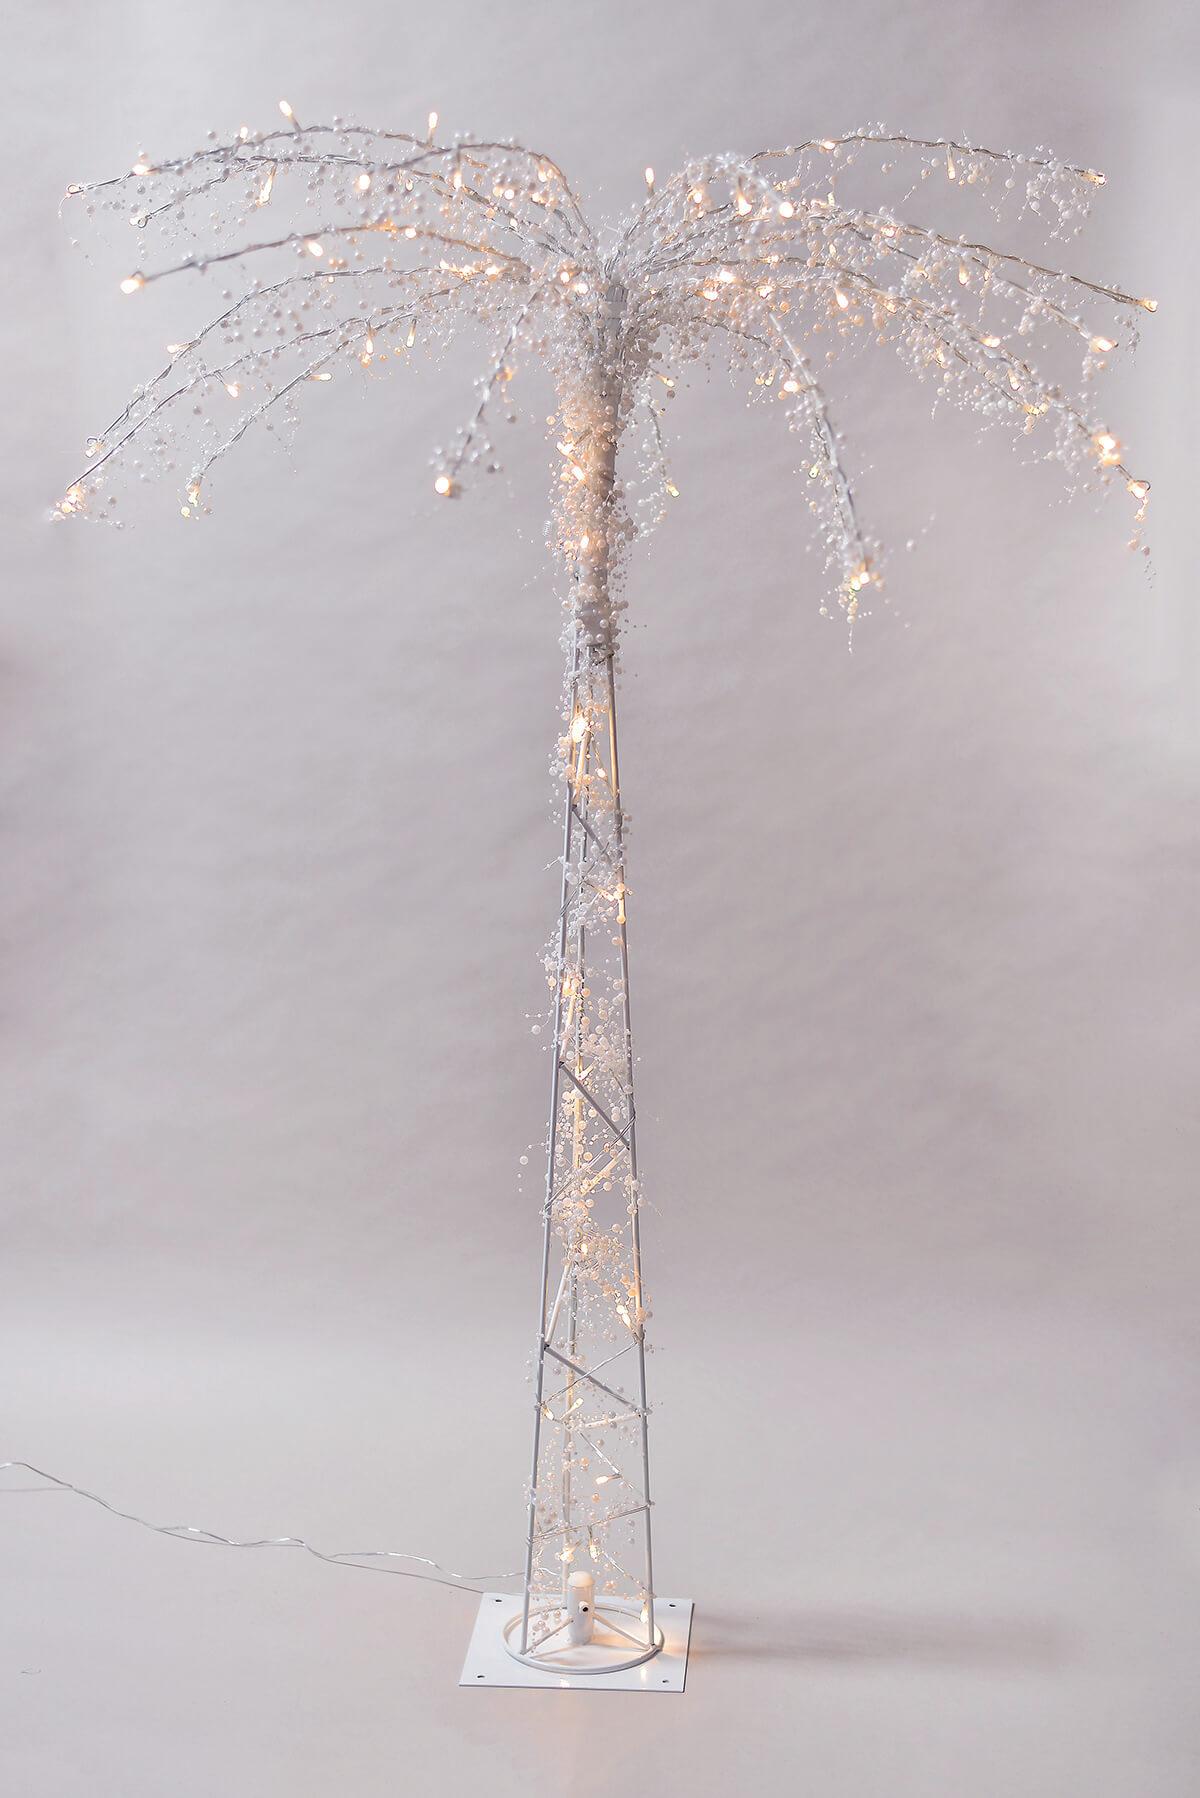 LED Lighted Palm Tree 4 Feet, 100 Warm White Lights